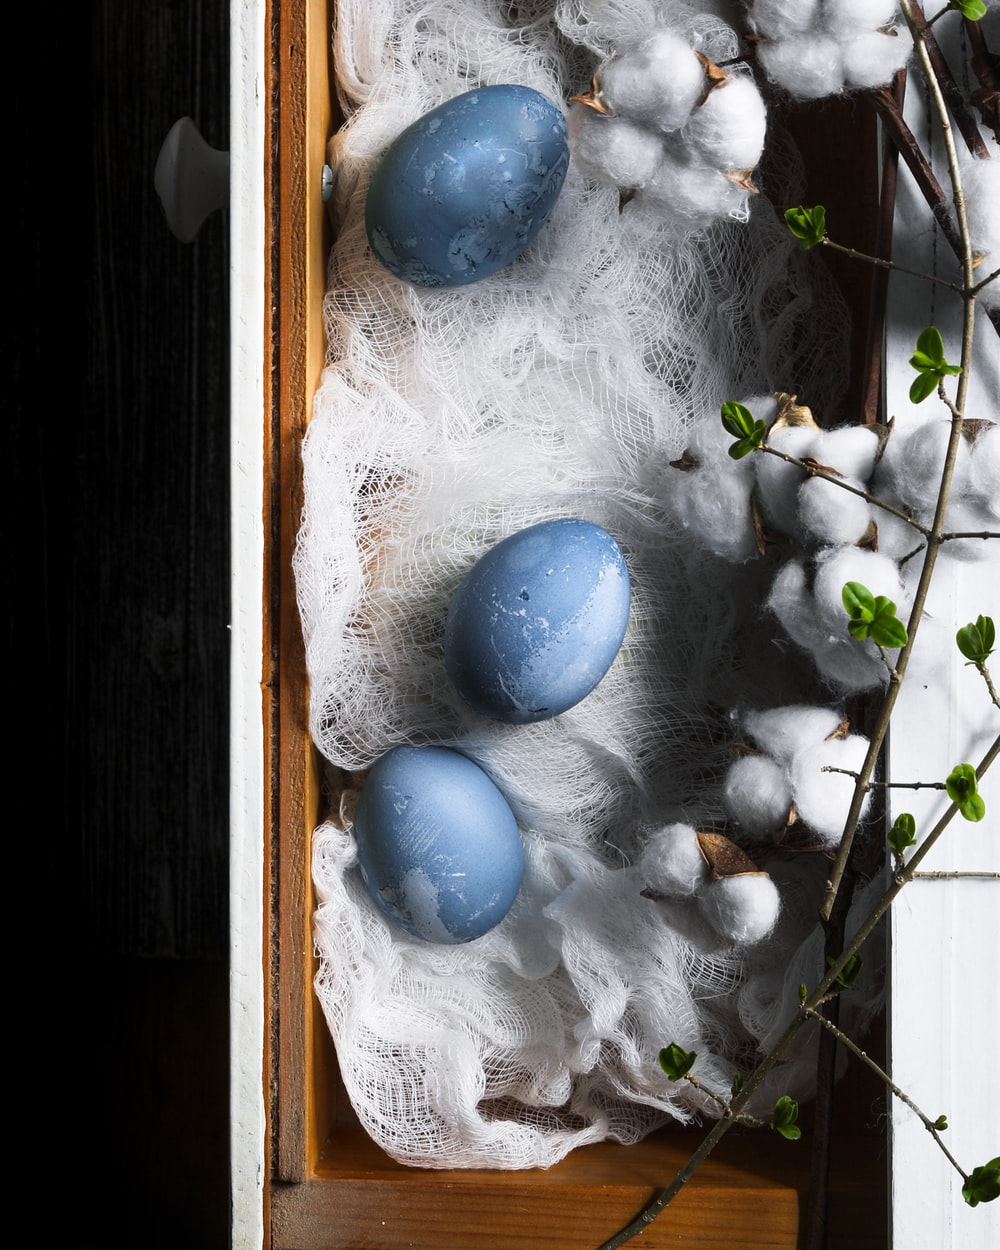 blue and white egg ornament